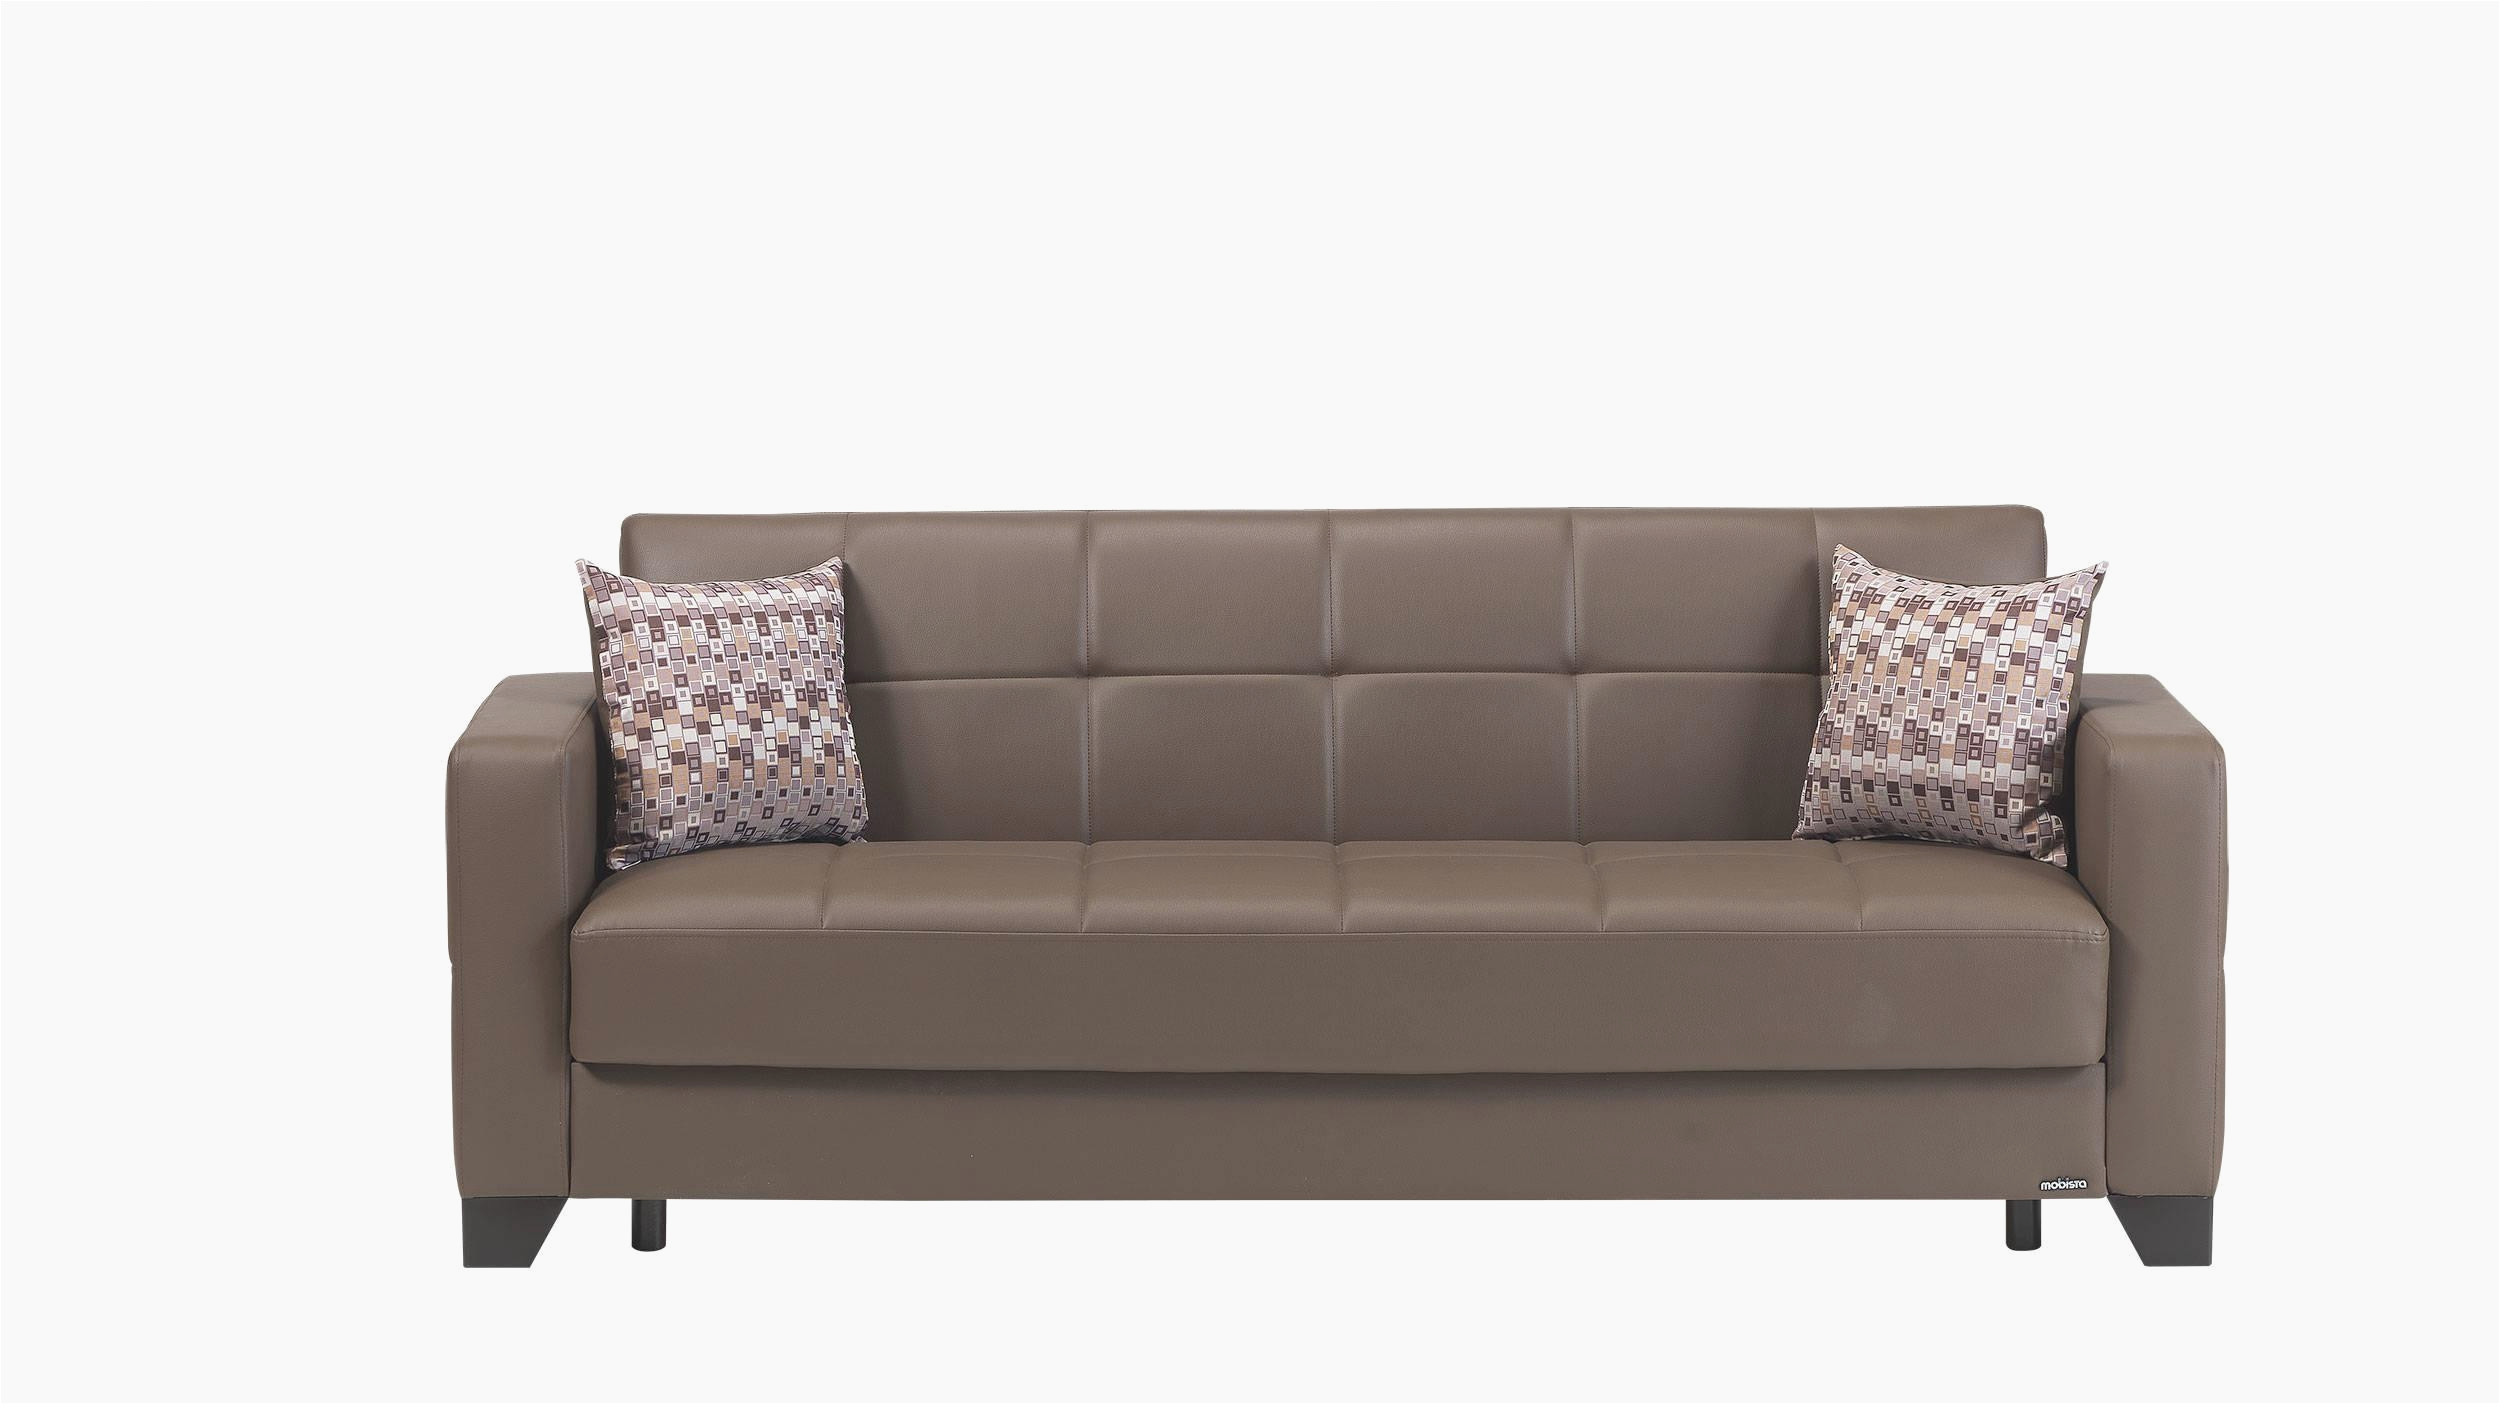 outdoor furniture sectional sofa fresh big sofa leder patio sofas awesome wicker outdoor 0d scheme scheme